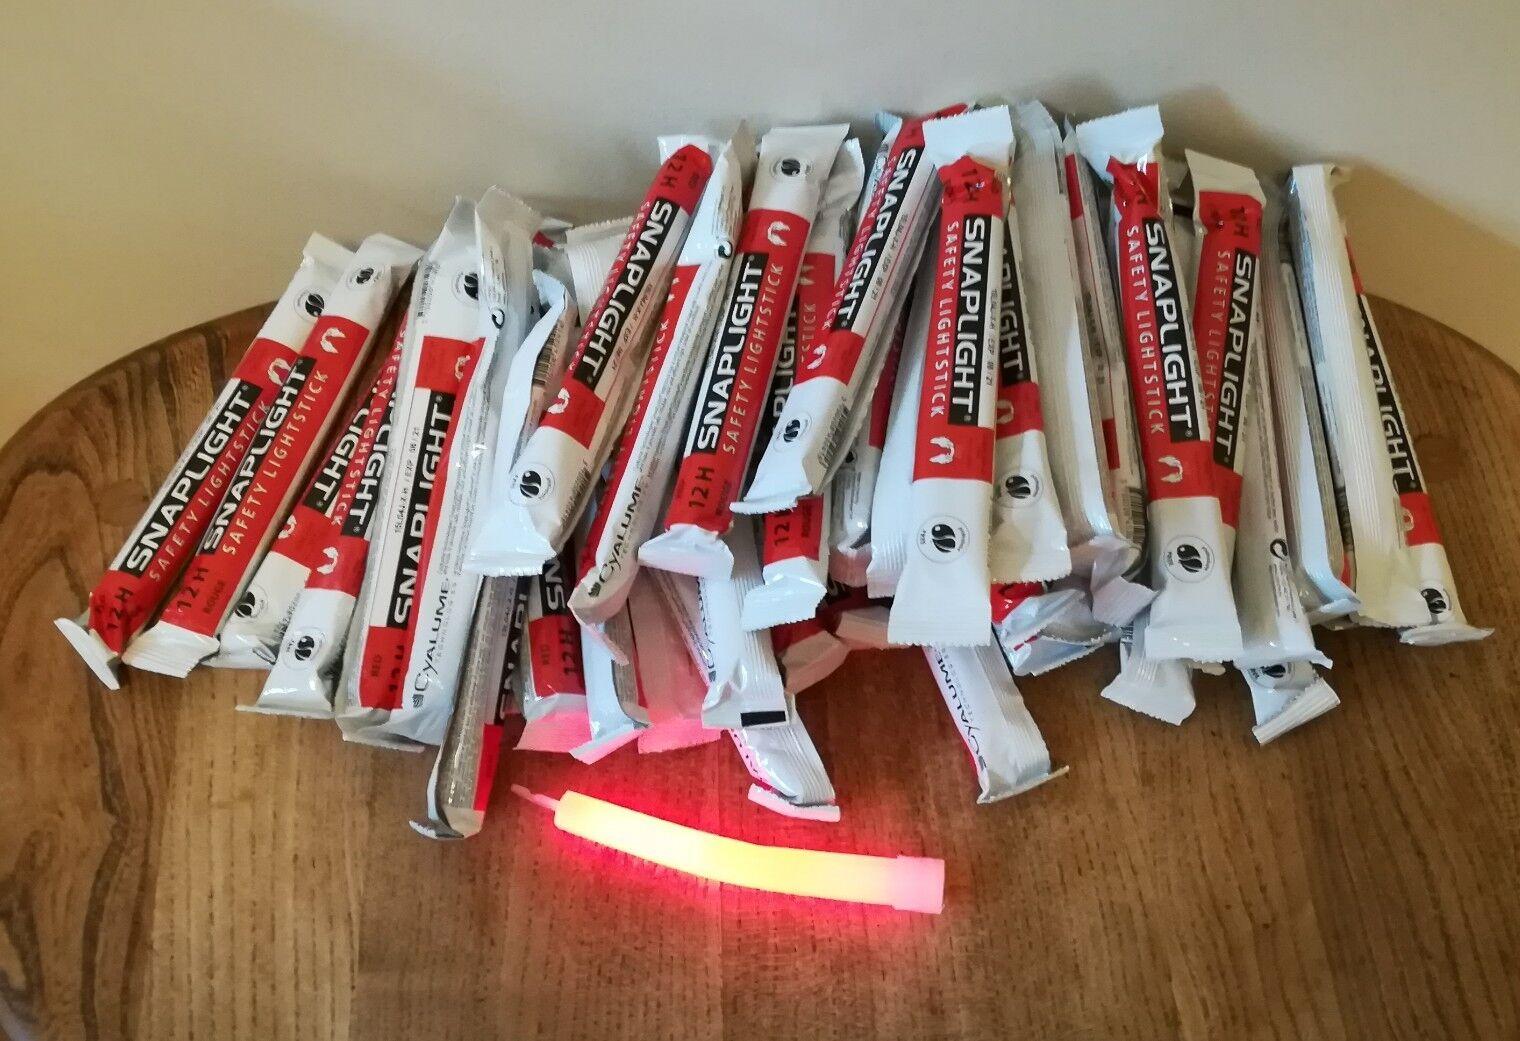 CYALUME Snaplight Rosso luminosi – 6 POLLICI x 50 scadenza 2021 nuova luce Snap Lite